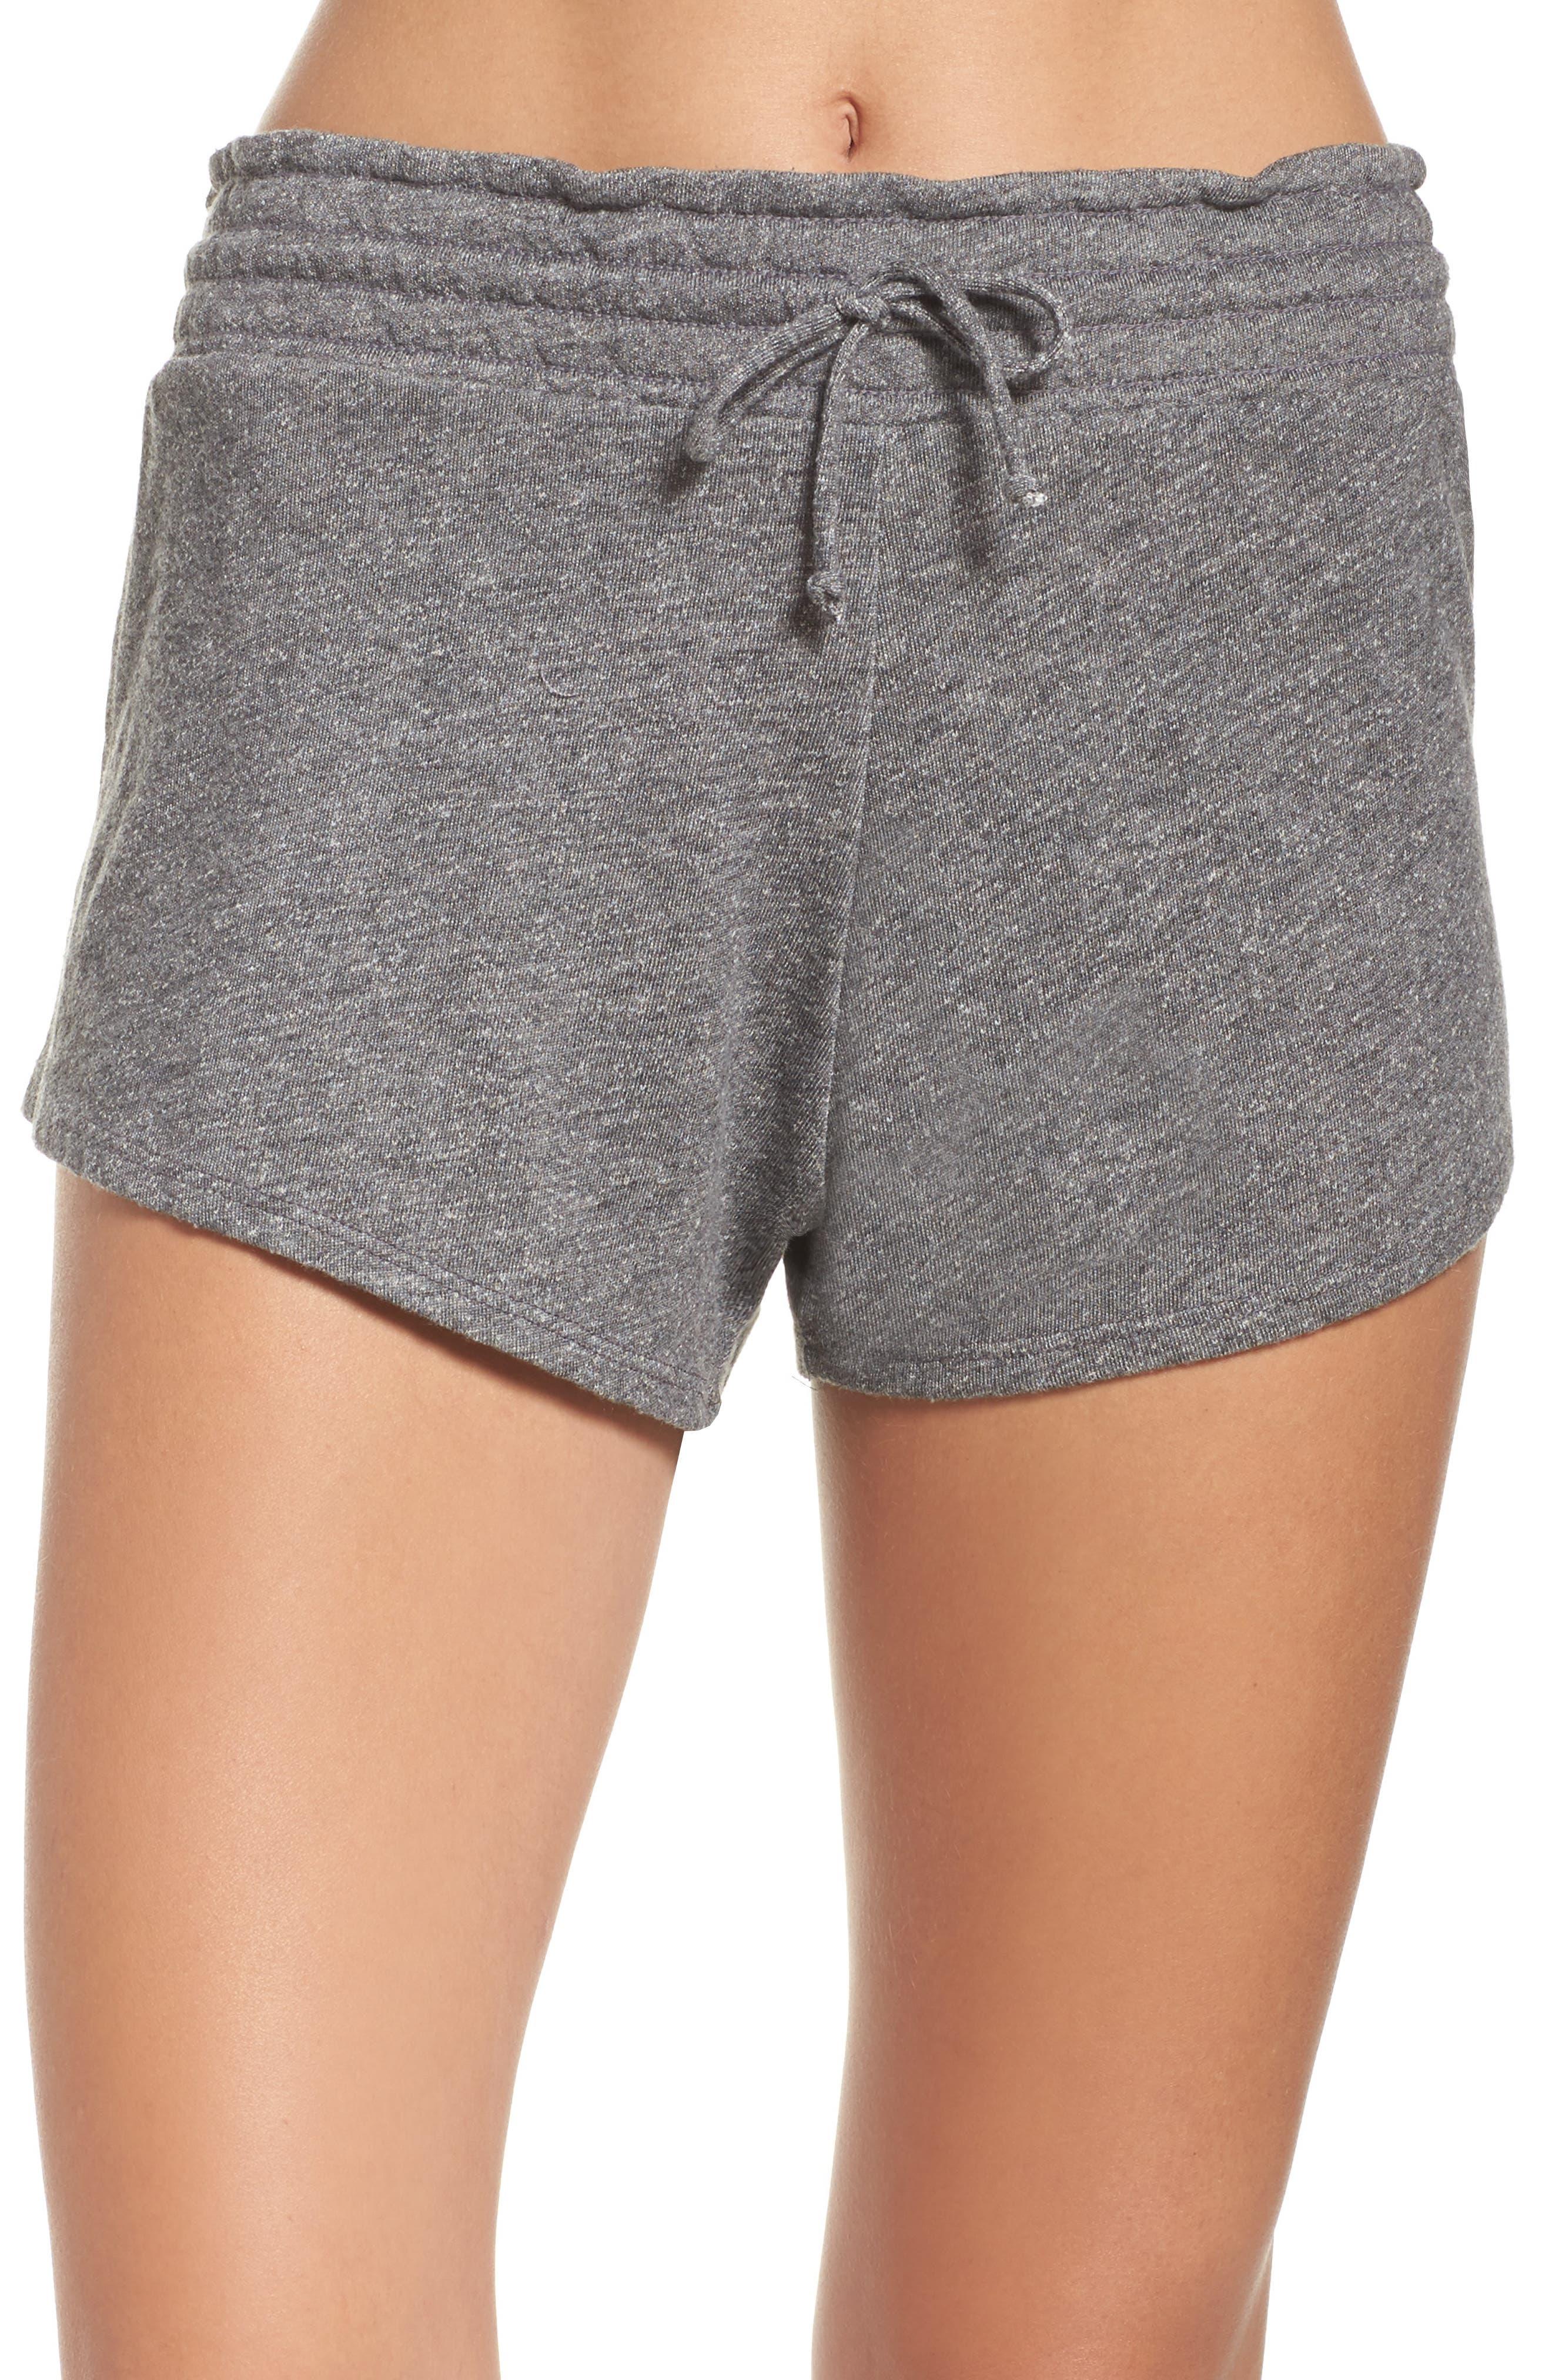 Dallas Shorts,                         Main,                         color, 001